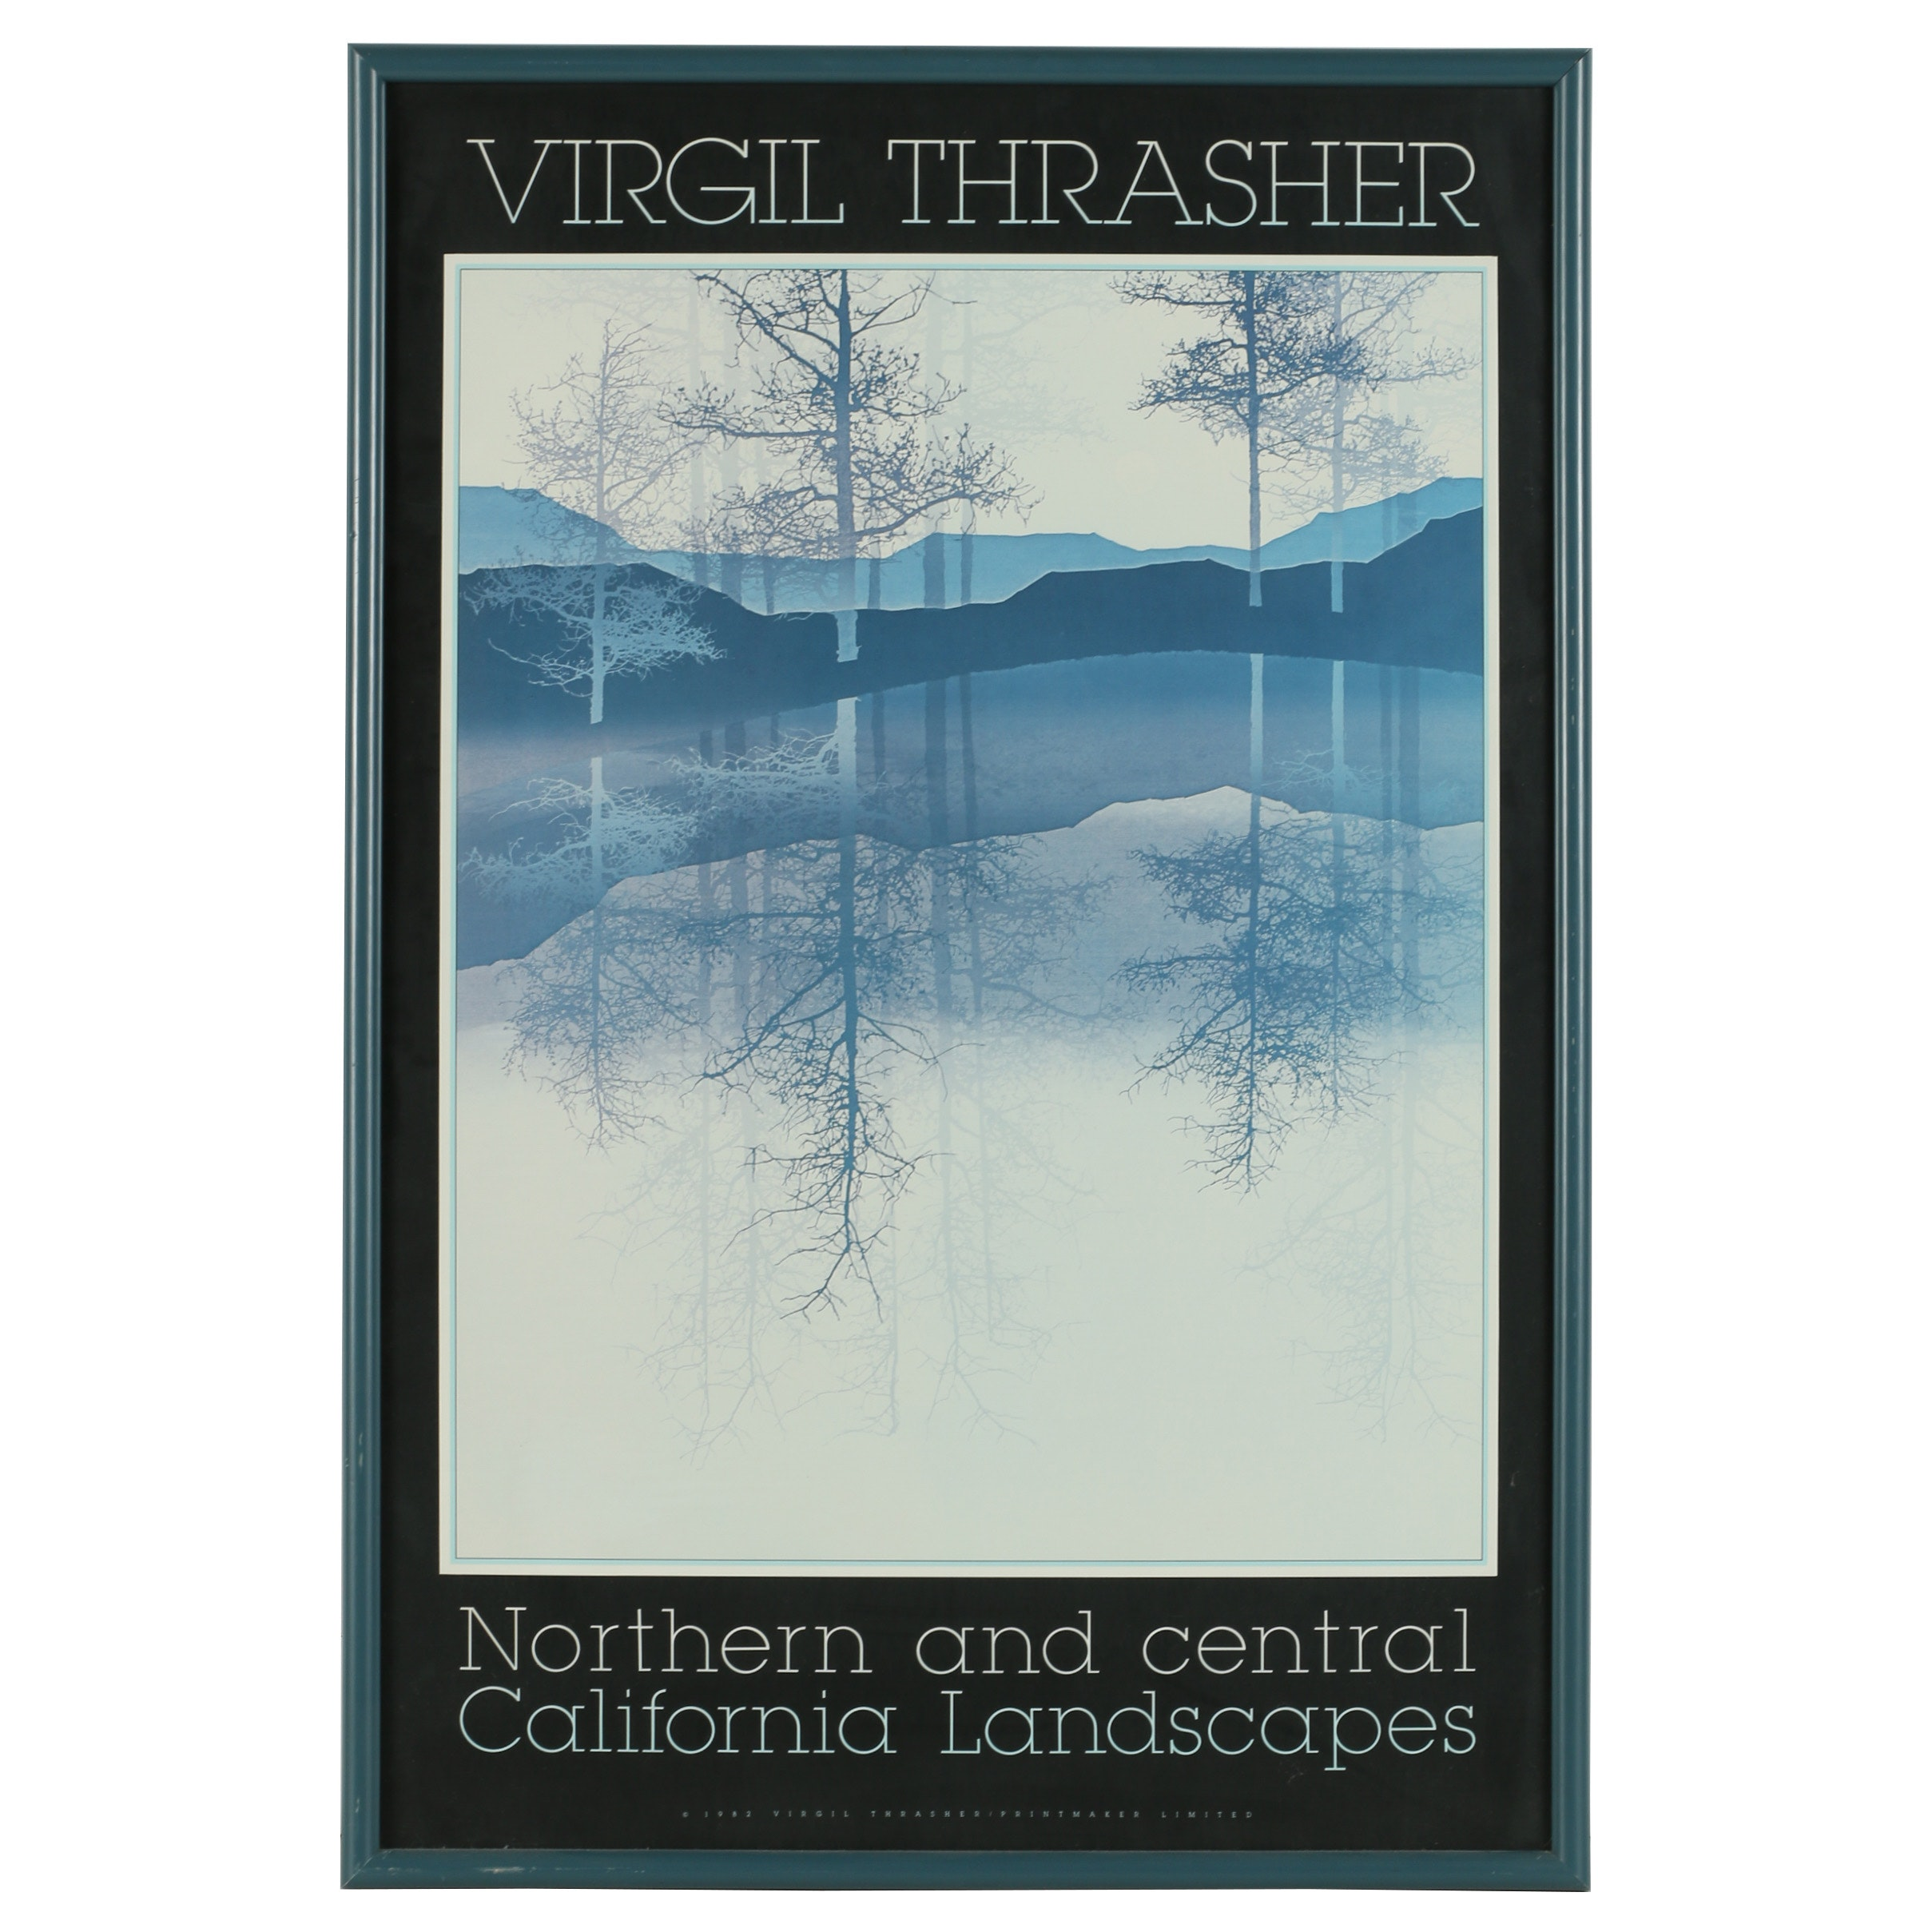 Offset Lithograph After Virgil Thrasher